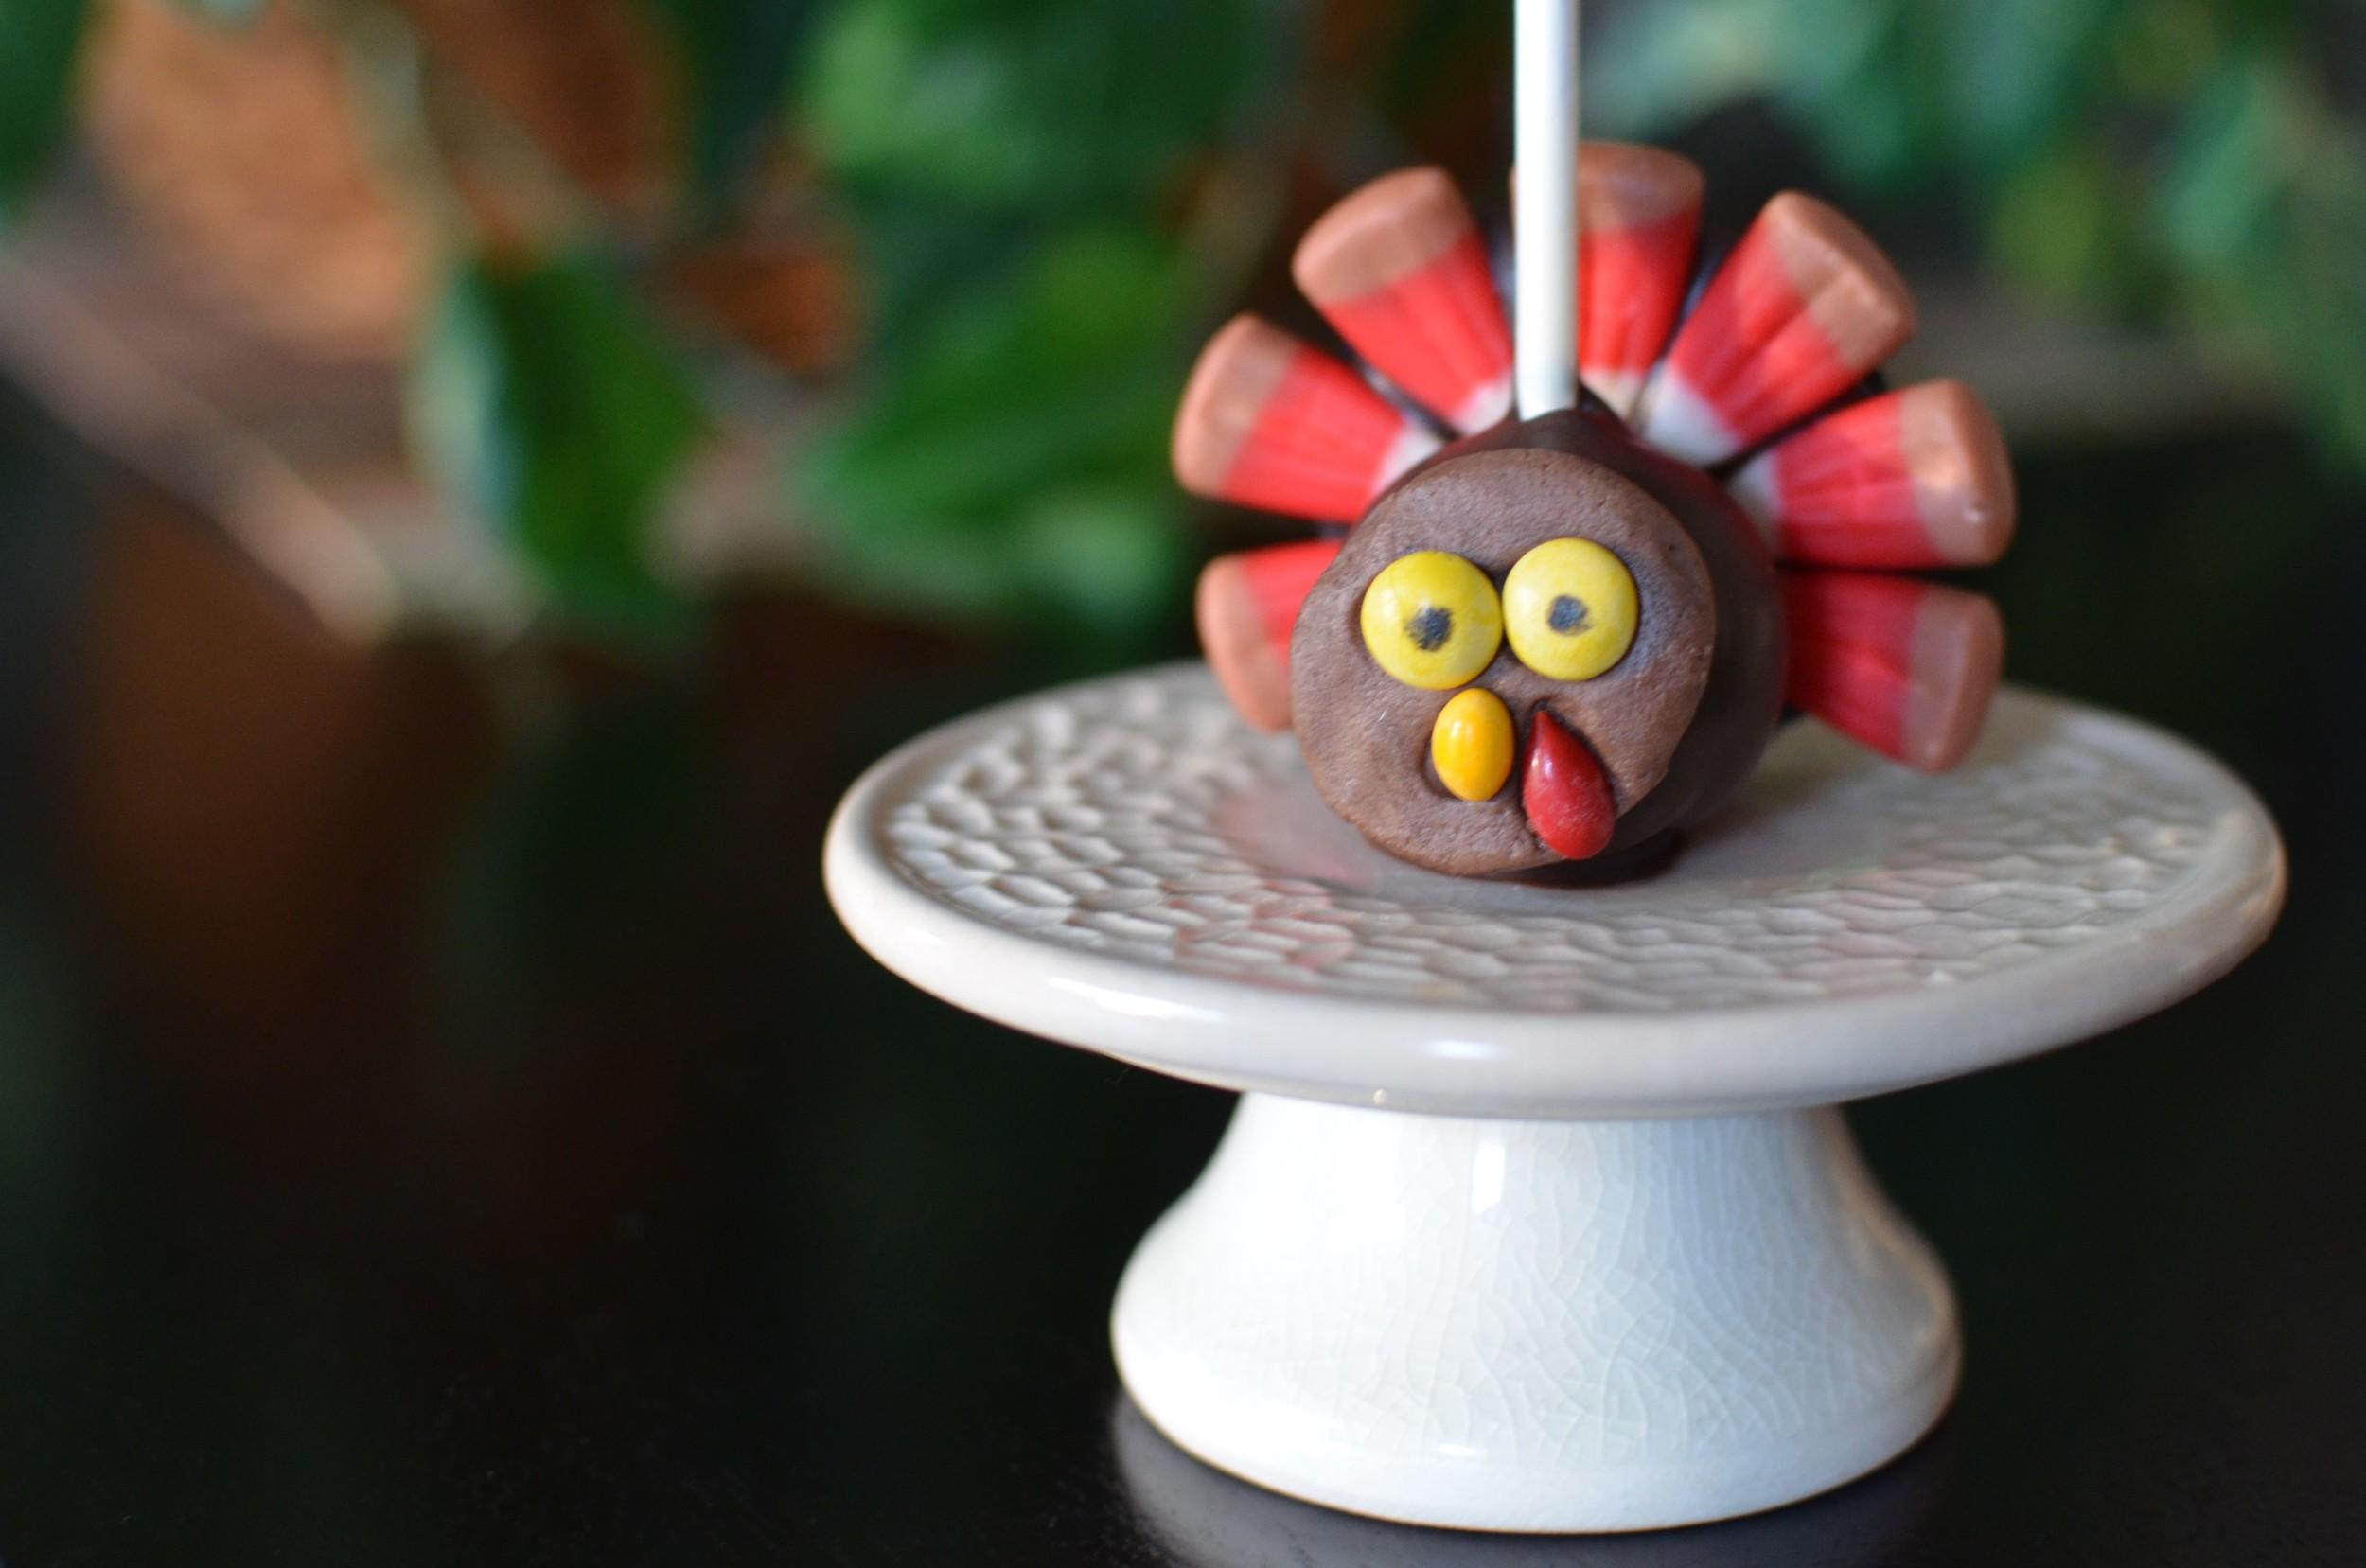 Howto make Thanksgiving cake pops - how to make turkey cake pops - PHOTOS